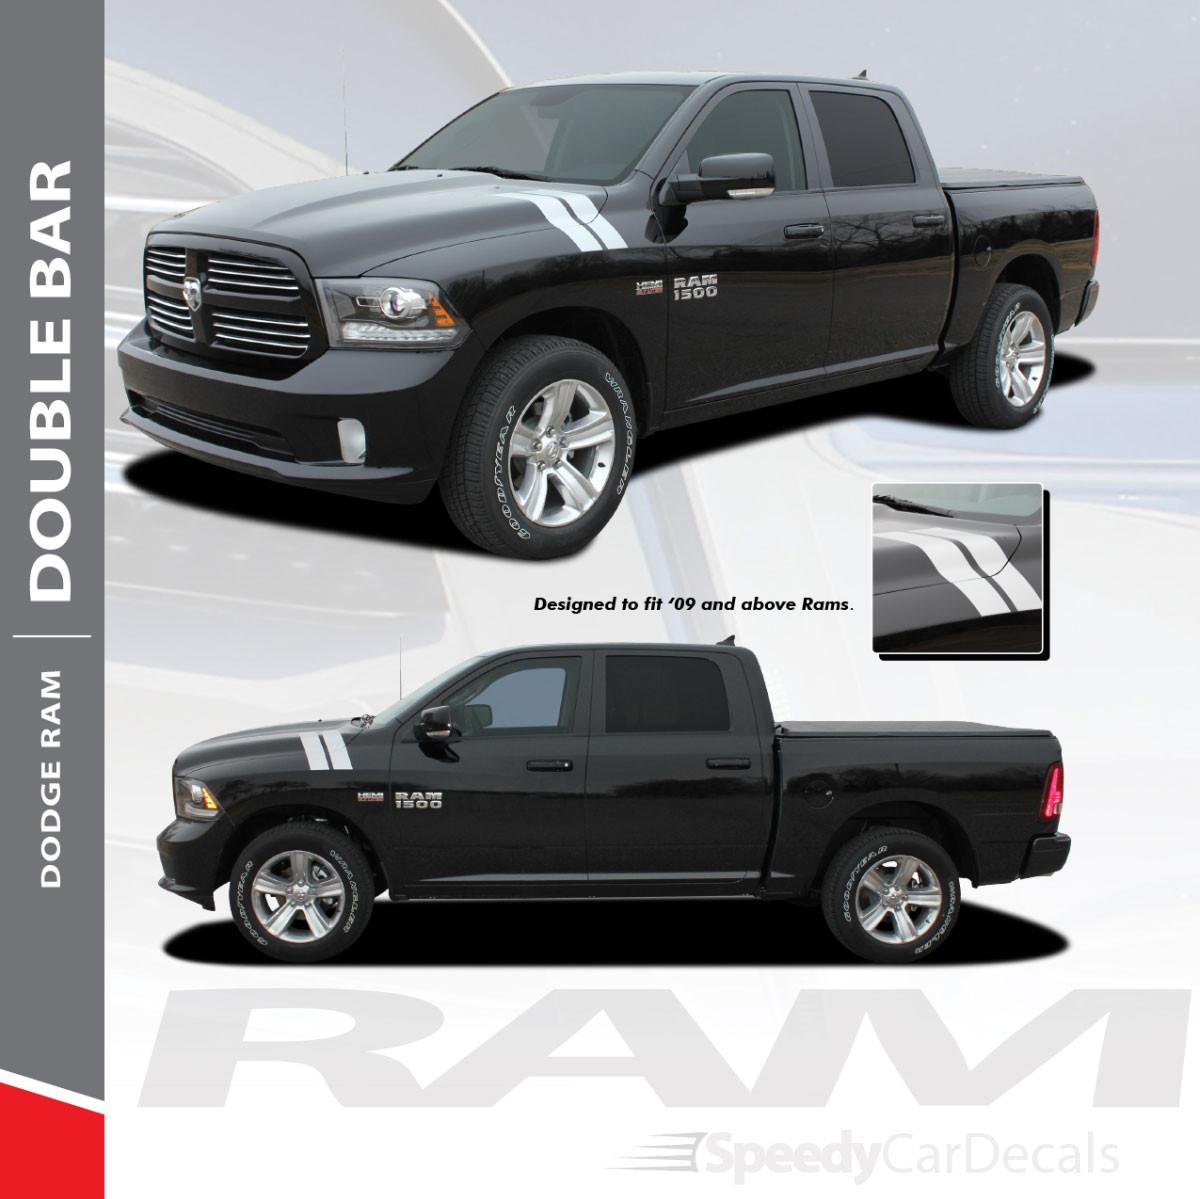 2009-2018 Dodge Ram 1500 DOUBLE BAR Stripes